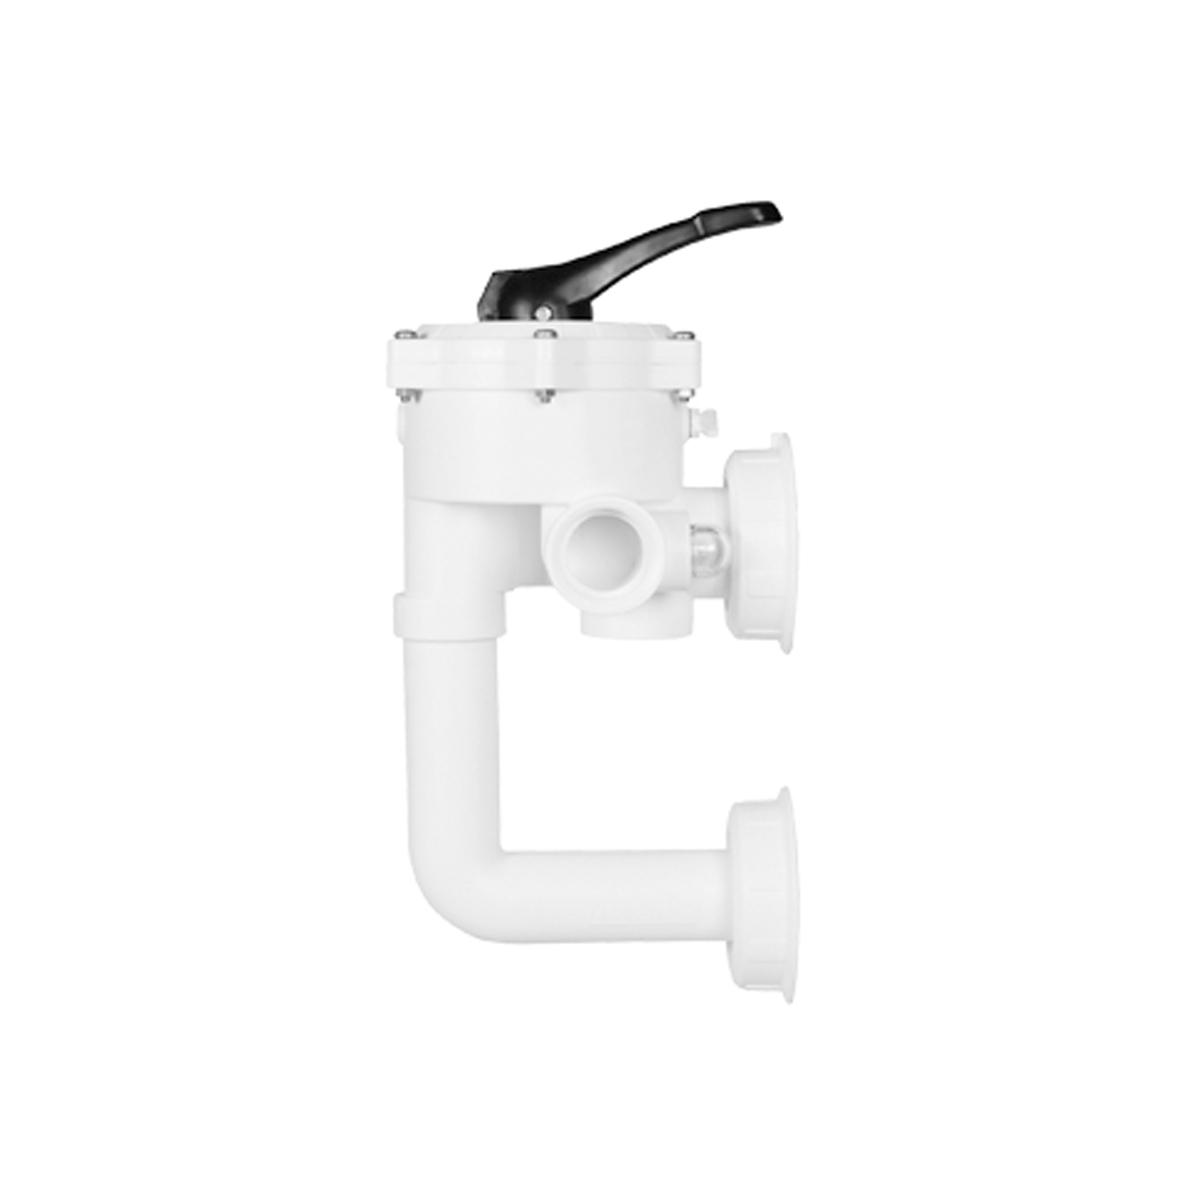 "Back wash valve V6 ND SM10 3 1 1/2"" ABS white BSP thread, Top+Bottom slip d50 metric MOP 3,5 bar NBR tpe incl. pipe-system single packed, pipe elbow distance 155 mm, Praher-label INNSBRUCK  glued Back wash valve V6 ND SM10 3 1 1/2"" ABS white BSP thread, Top+Bottom slip d50 metric MOP 3,5 bar NBR tpe incl. pipe-system single packed, pipe elbow distance 155 mm, Praher-label INNSBRUCK  glued"